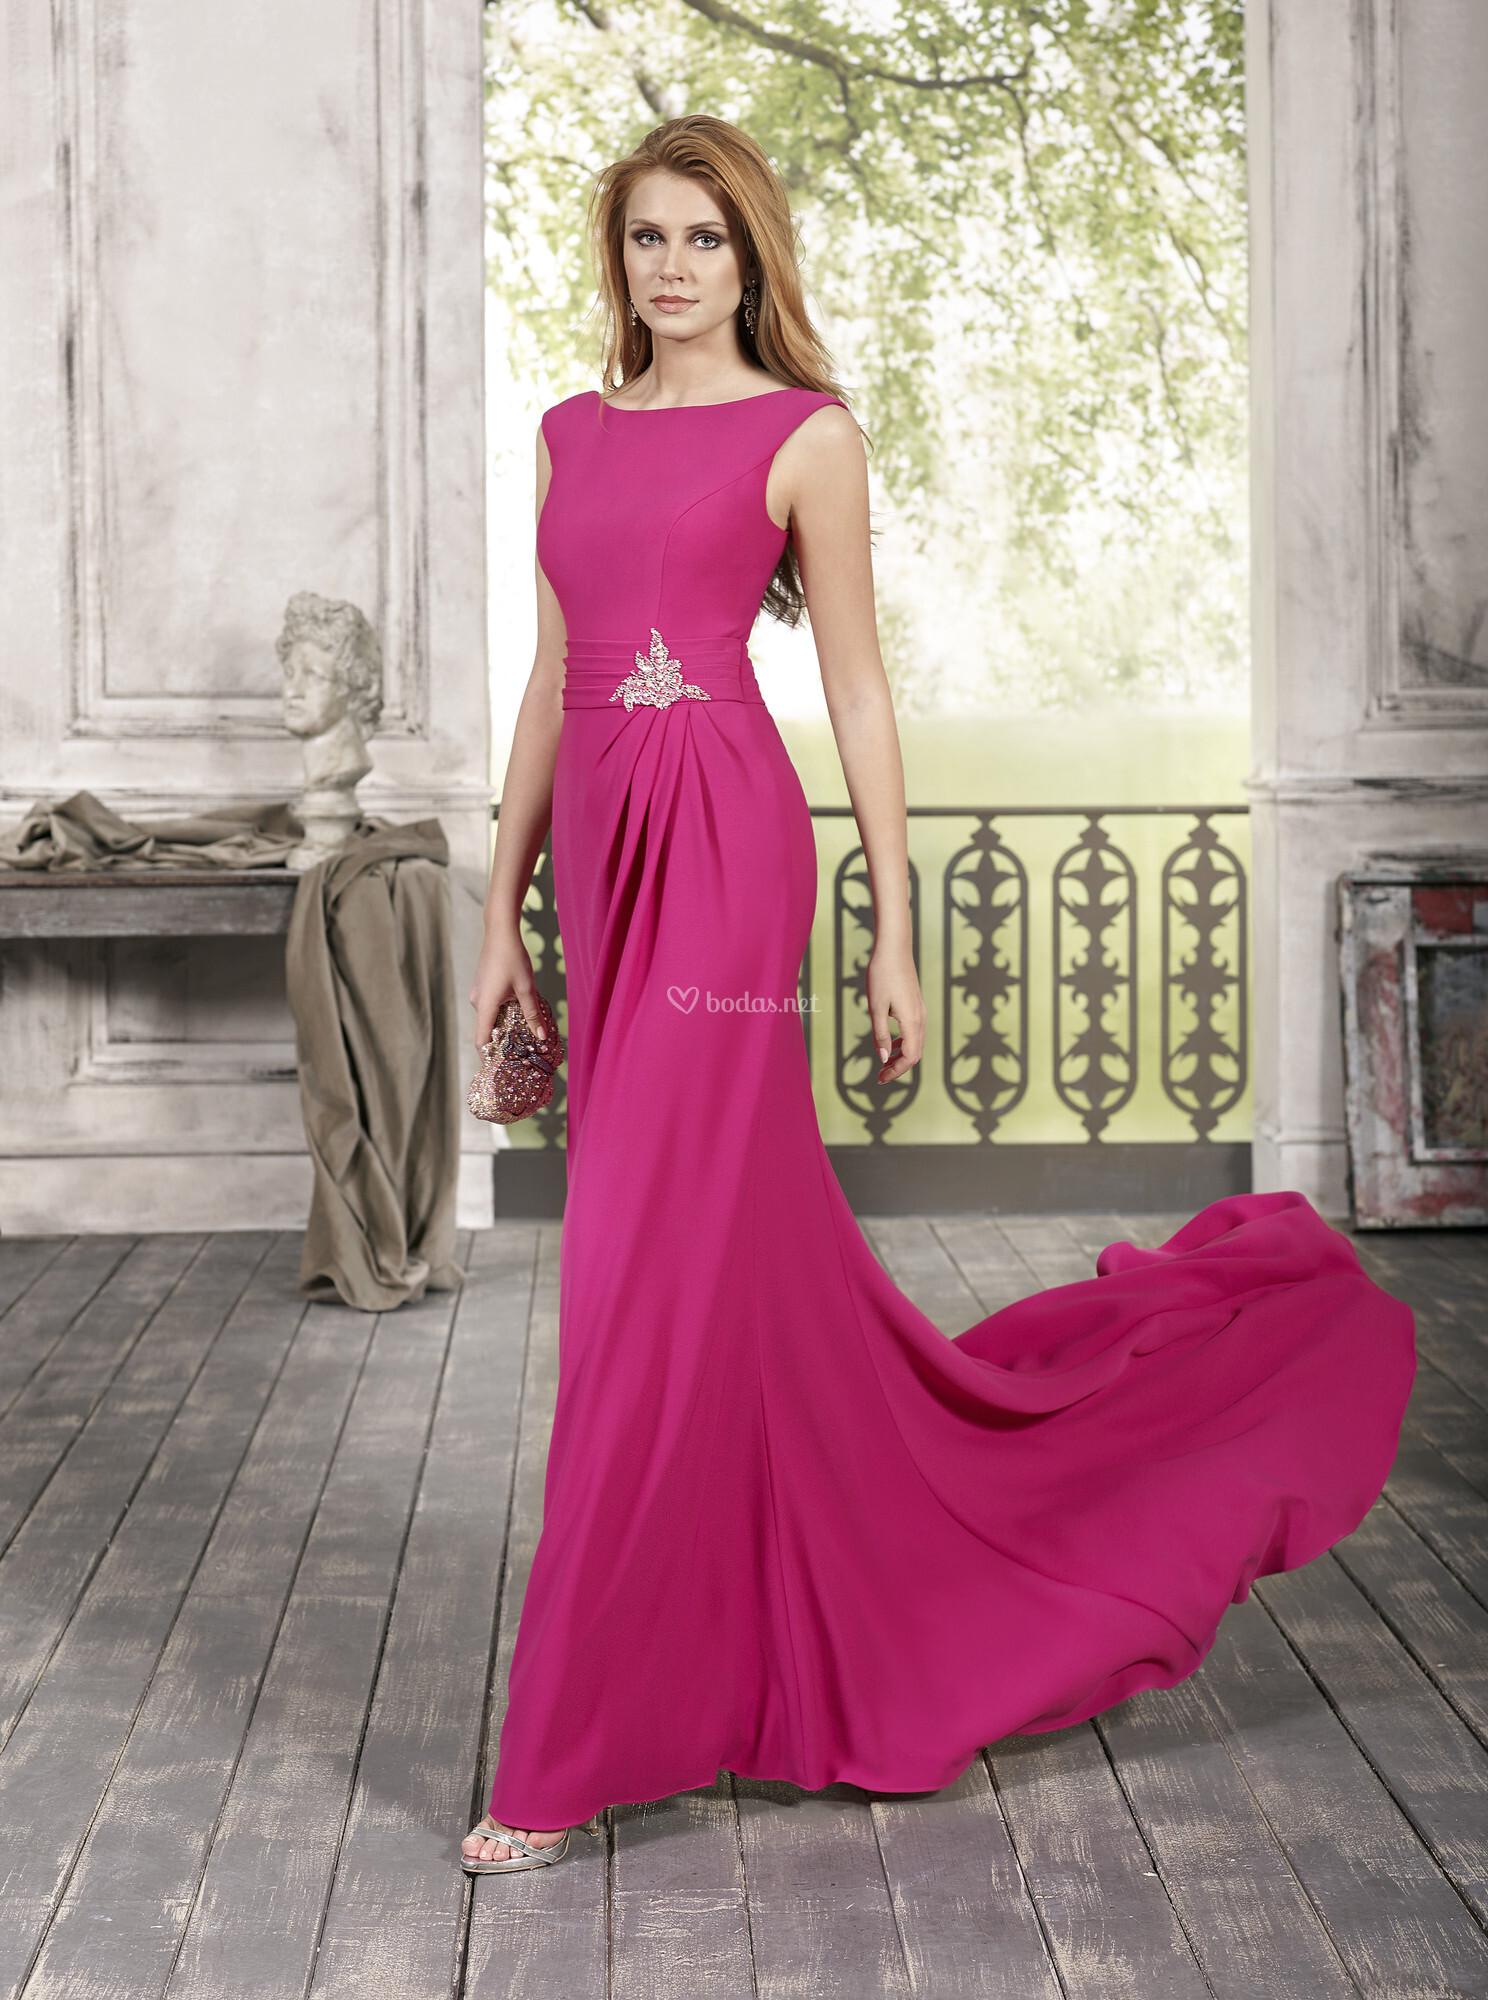 Magnificent Corte Ingles Vestidos De Novia Motif - Wedding Dress ...